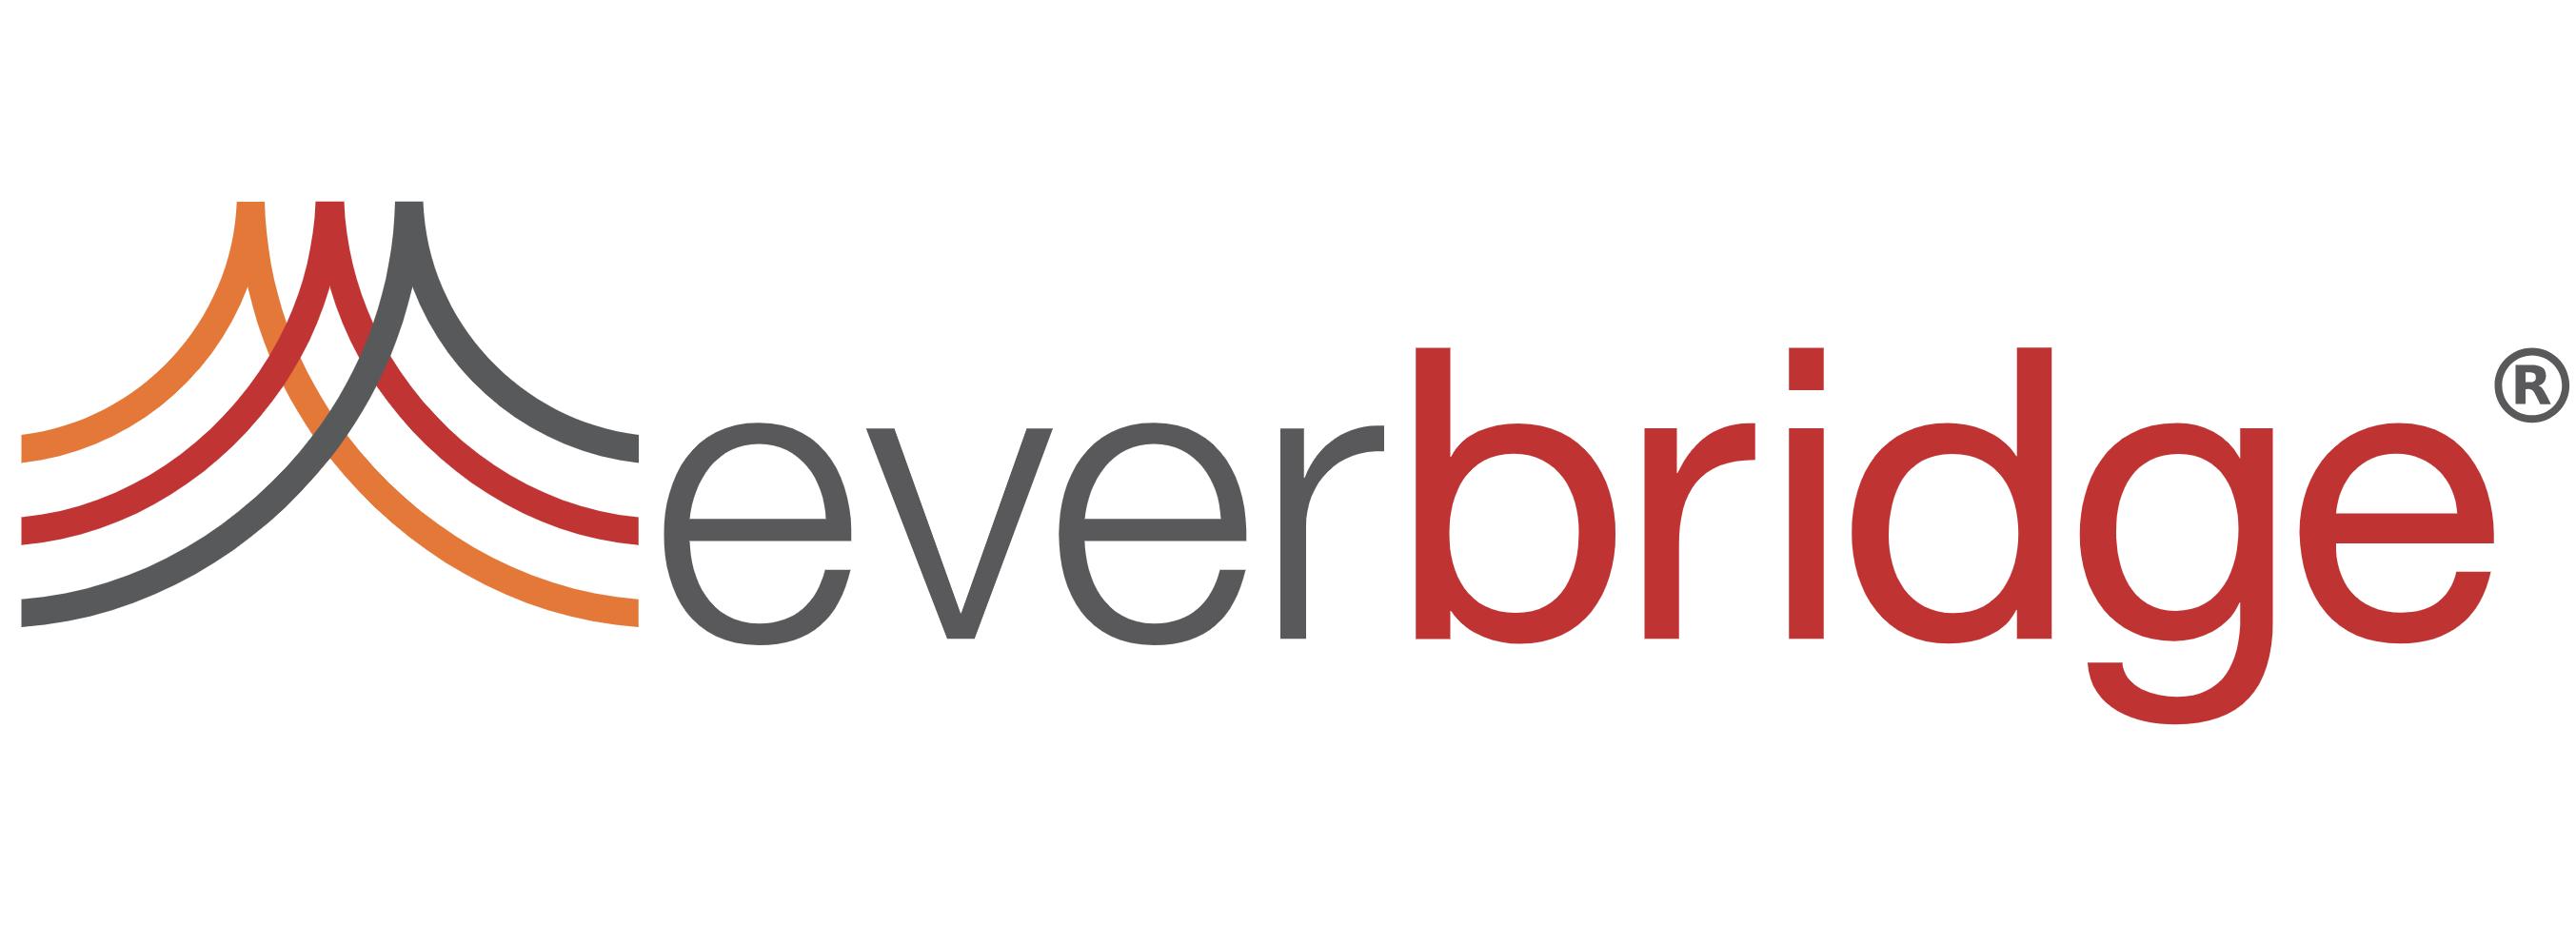 Everbridge's logo